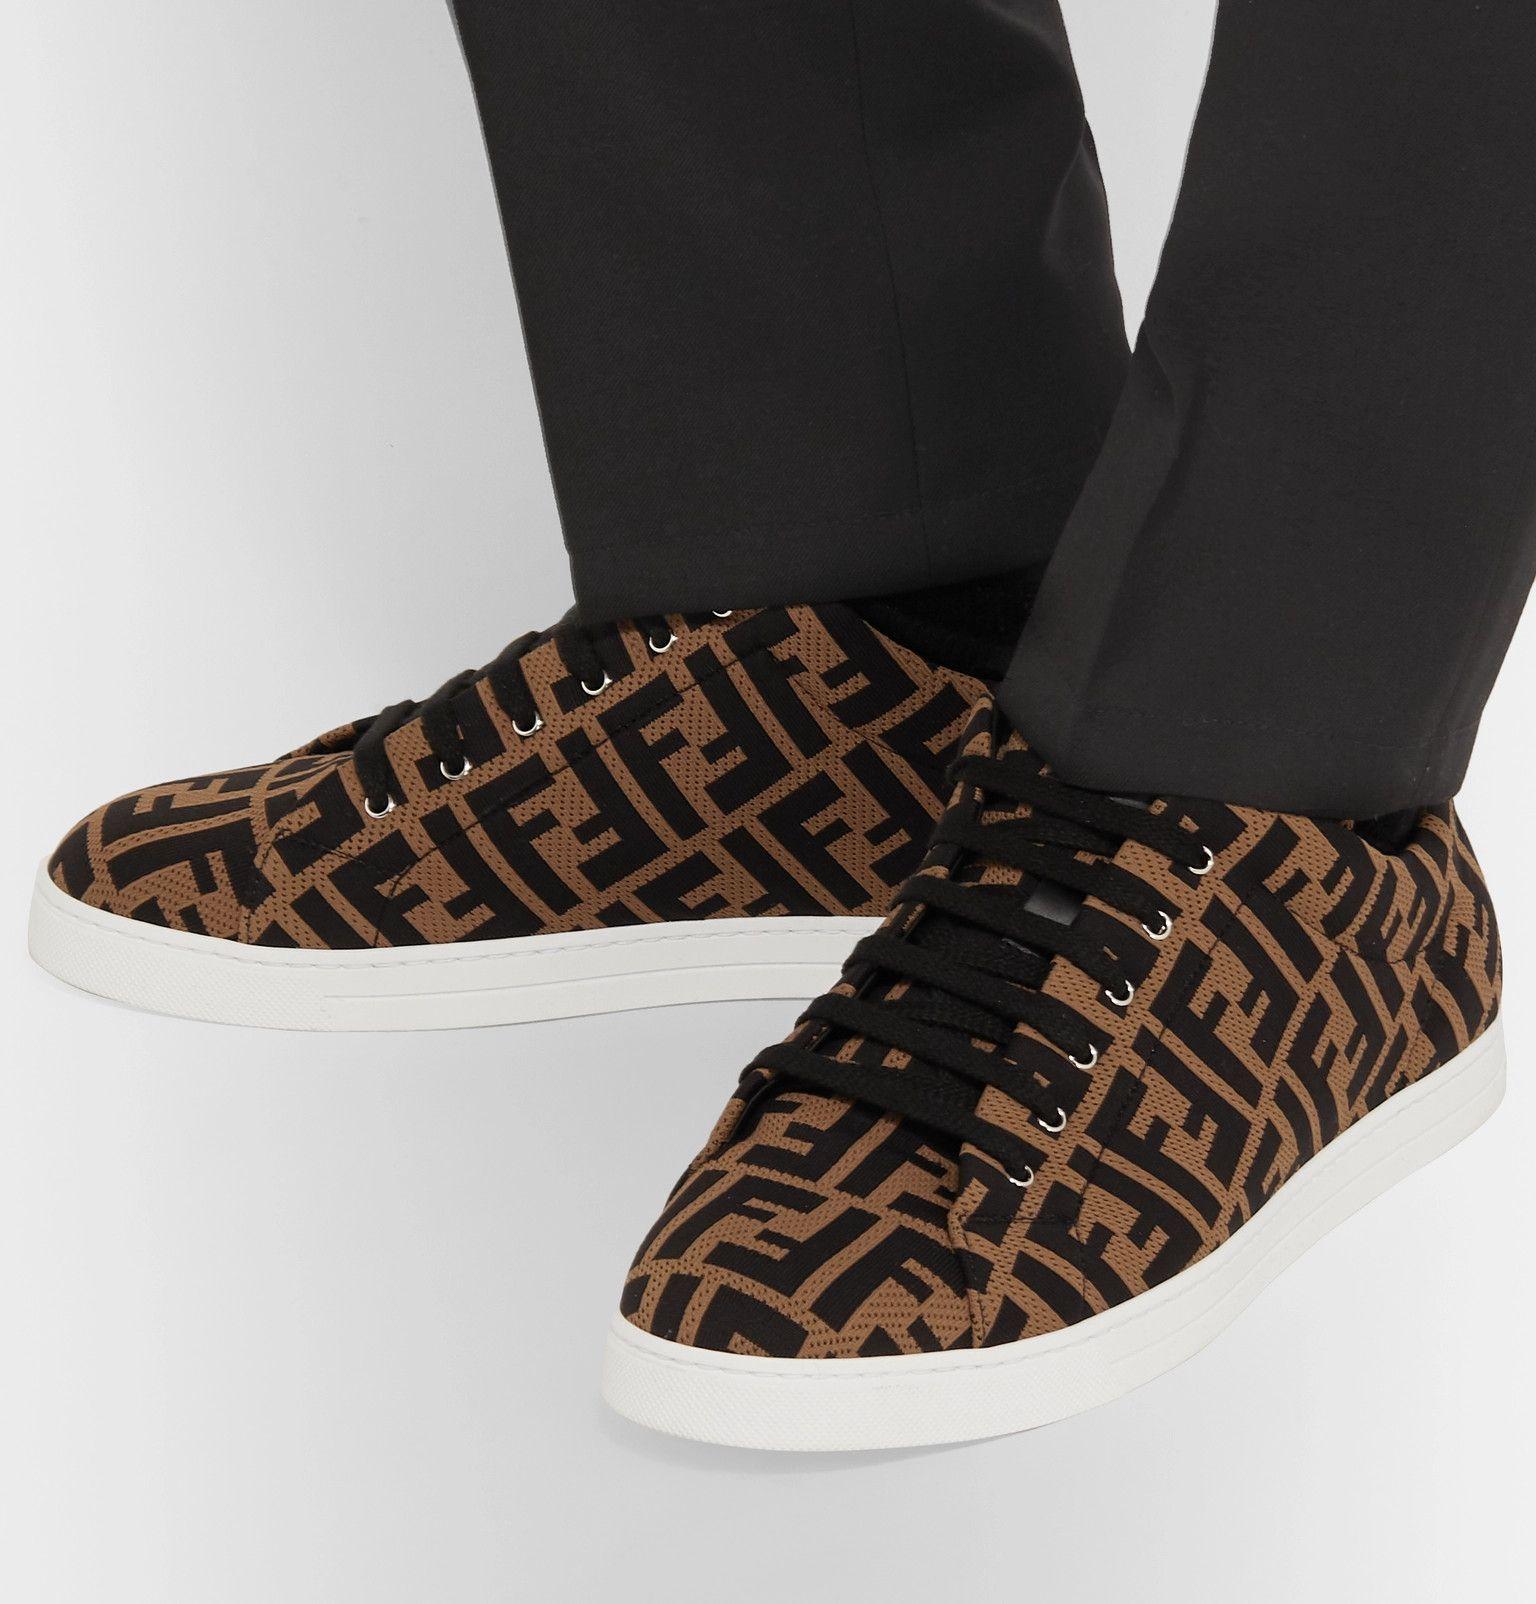 Fendi Leather-trimmed Logo-jacquard